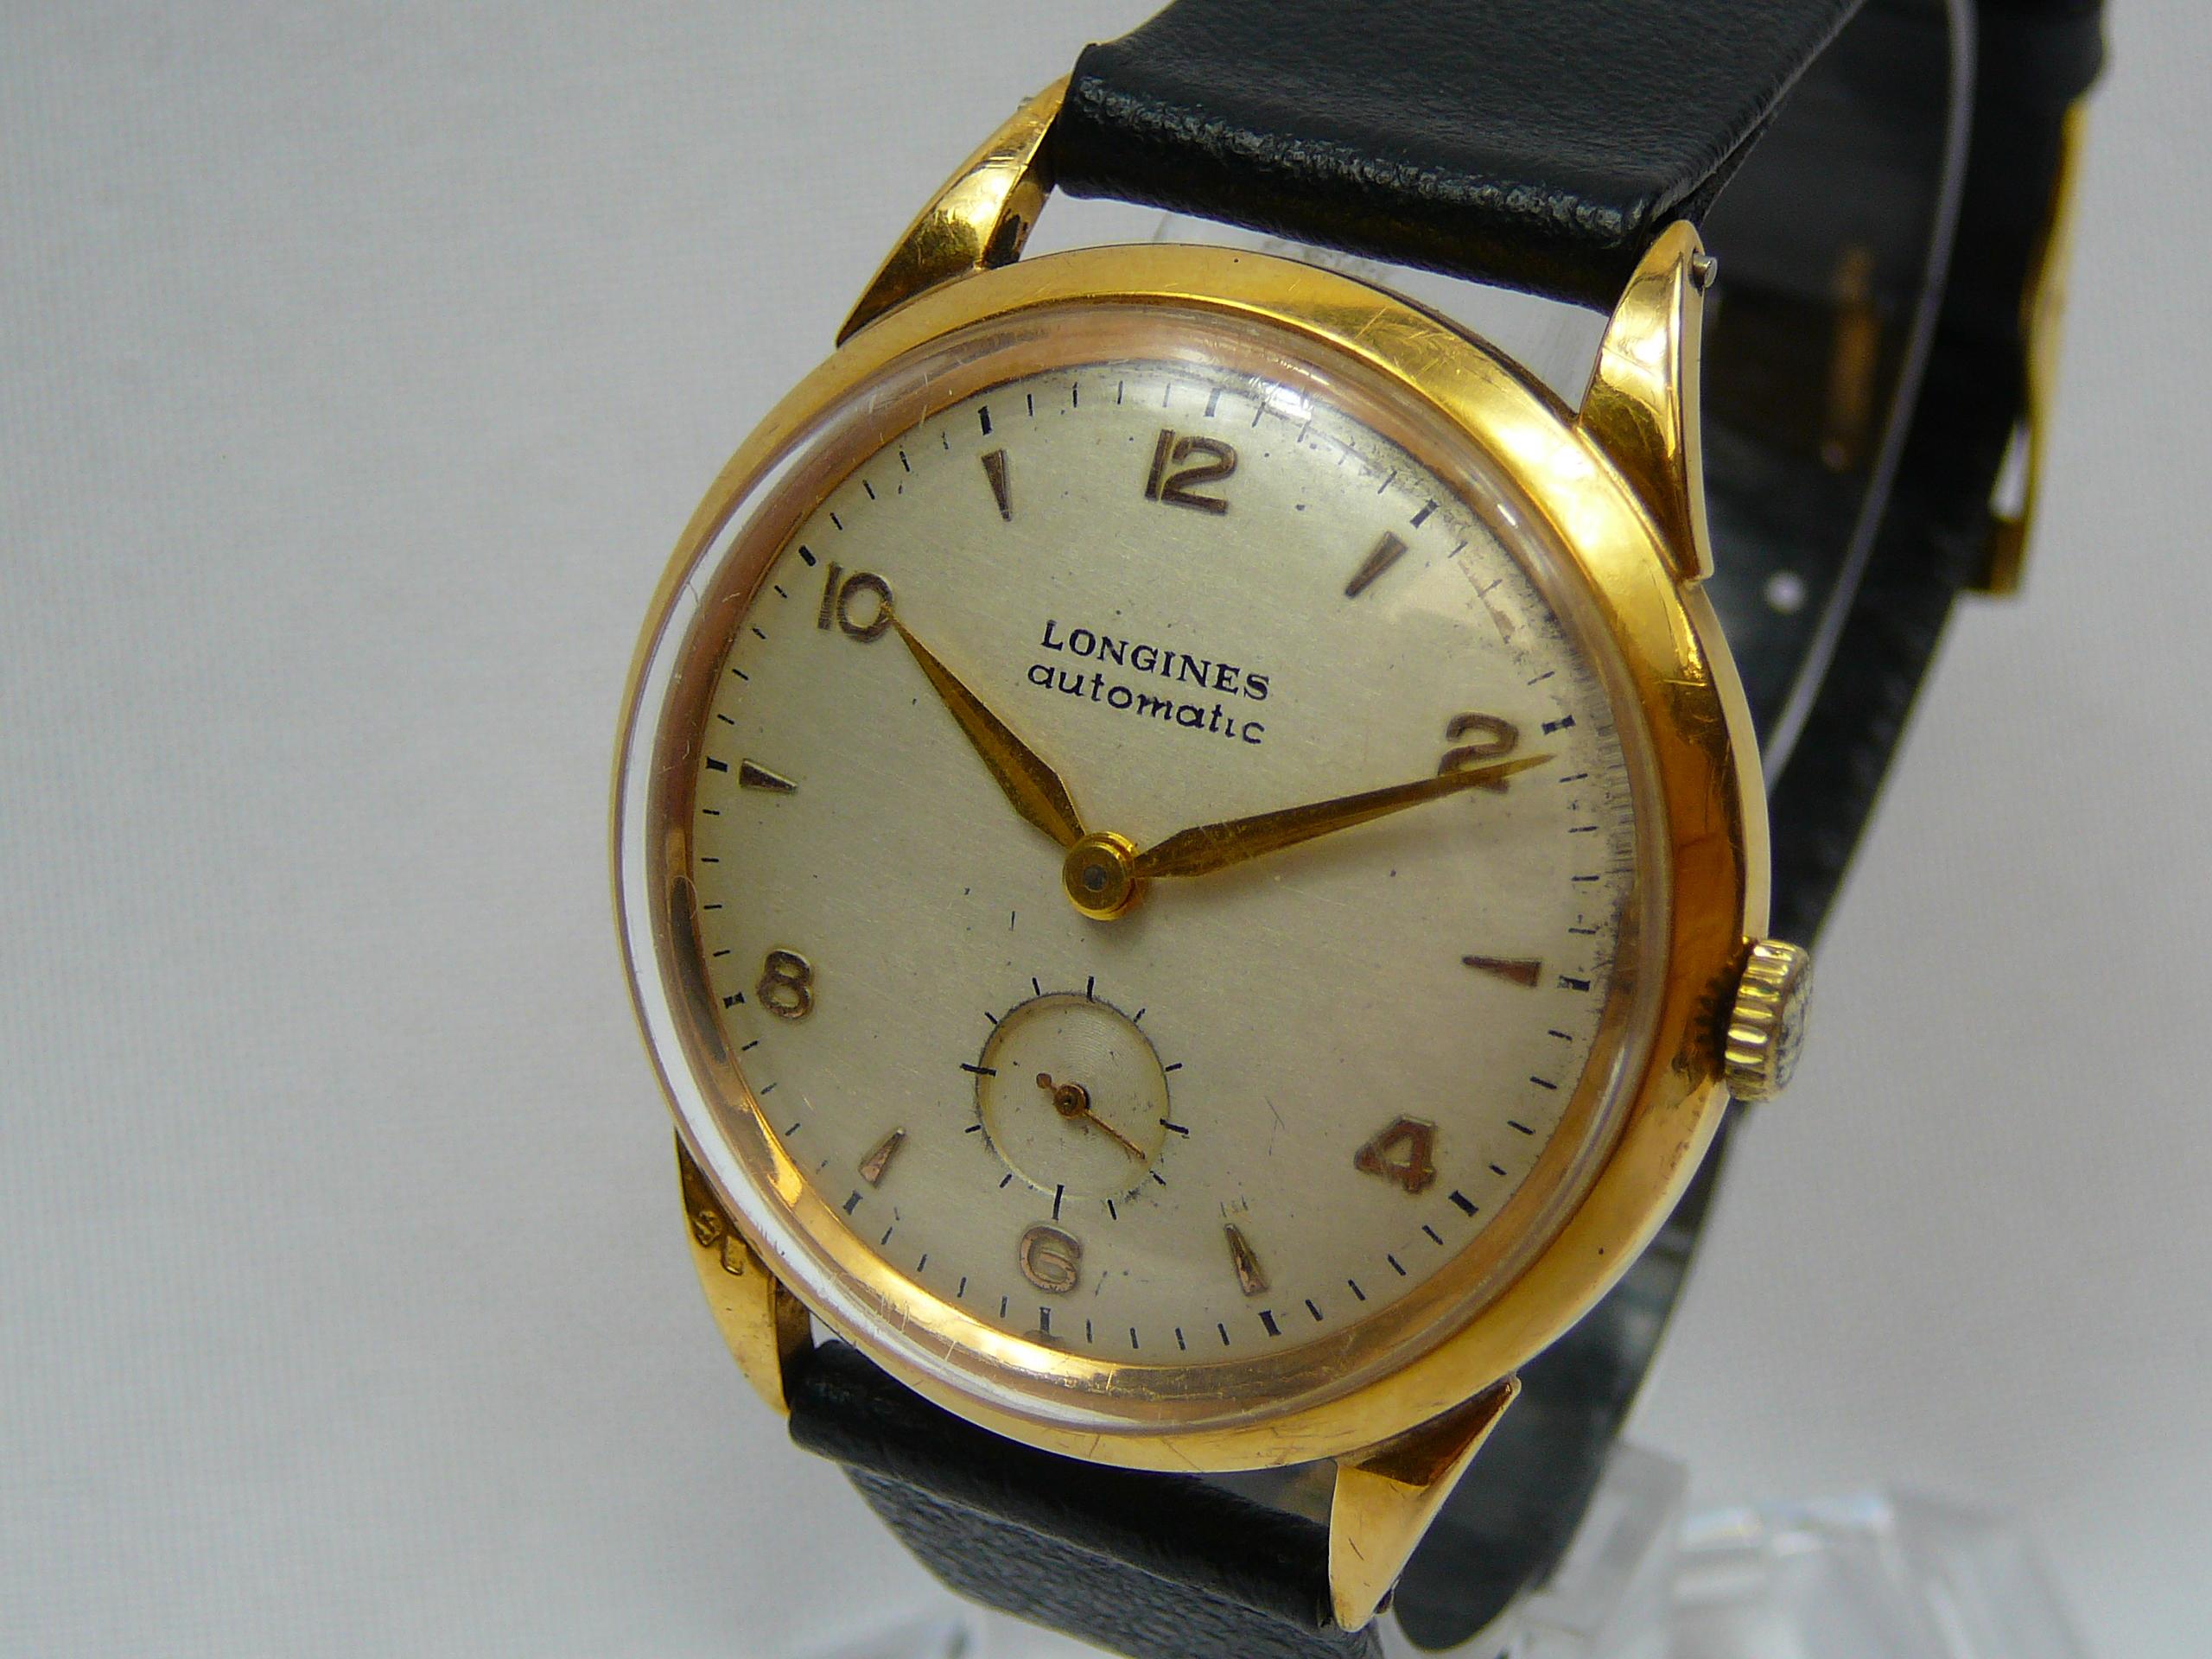 Gents Vintage Gold Longines Wrist Watch - Image 2 of 3